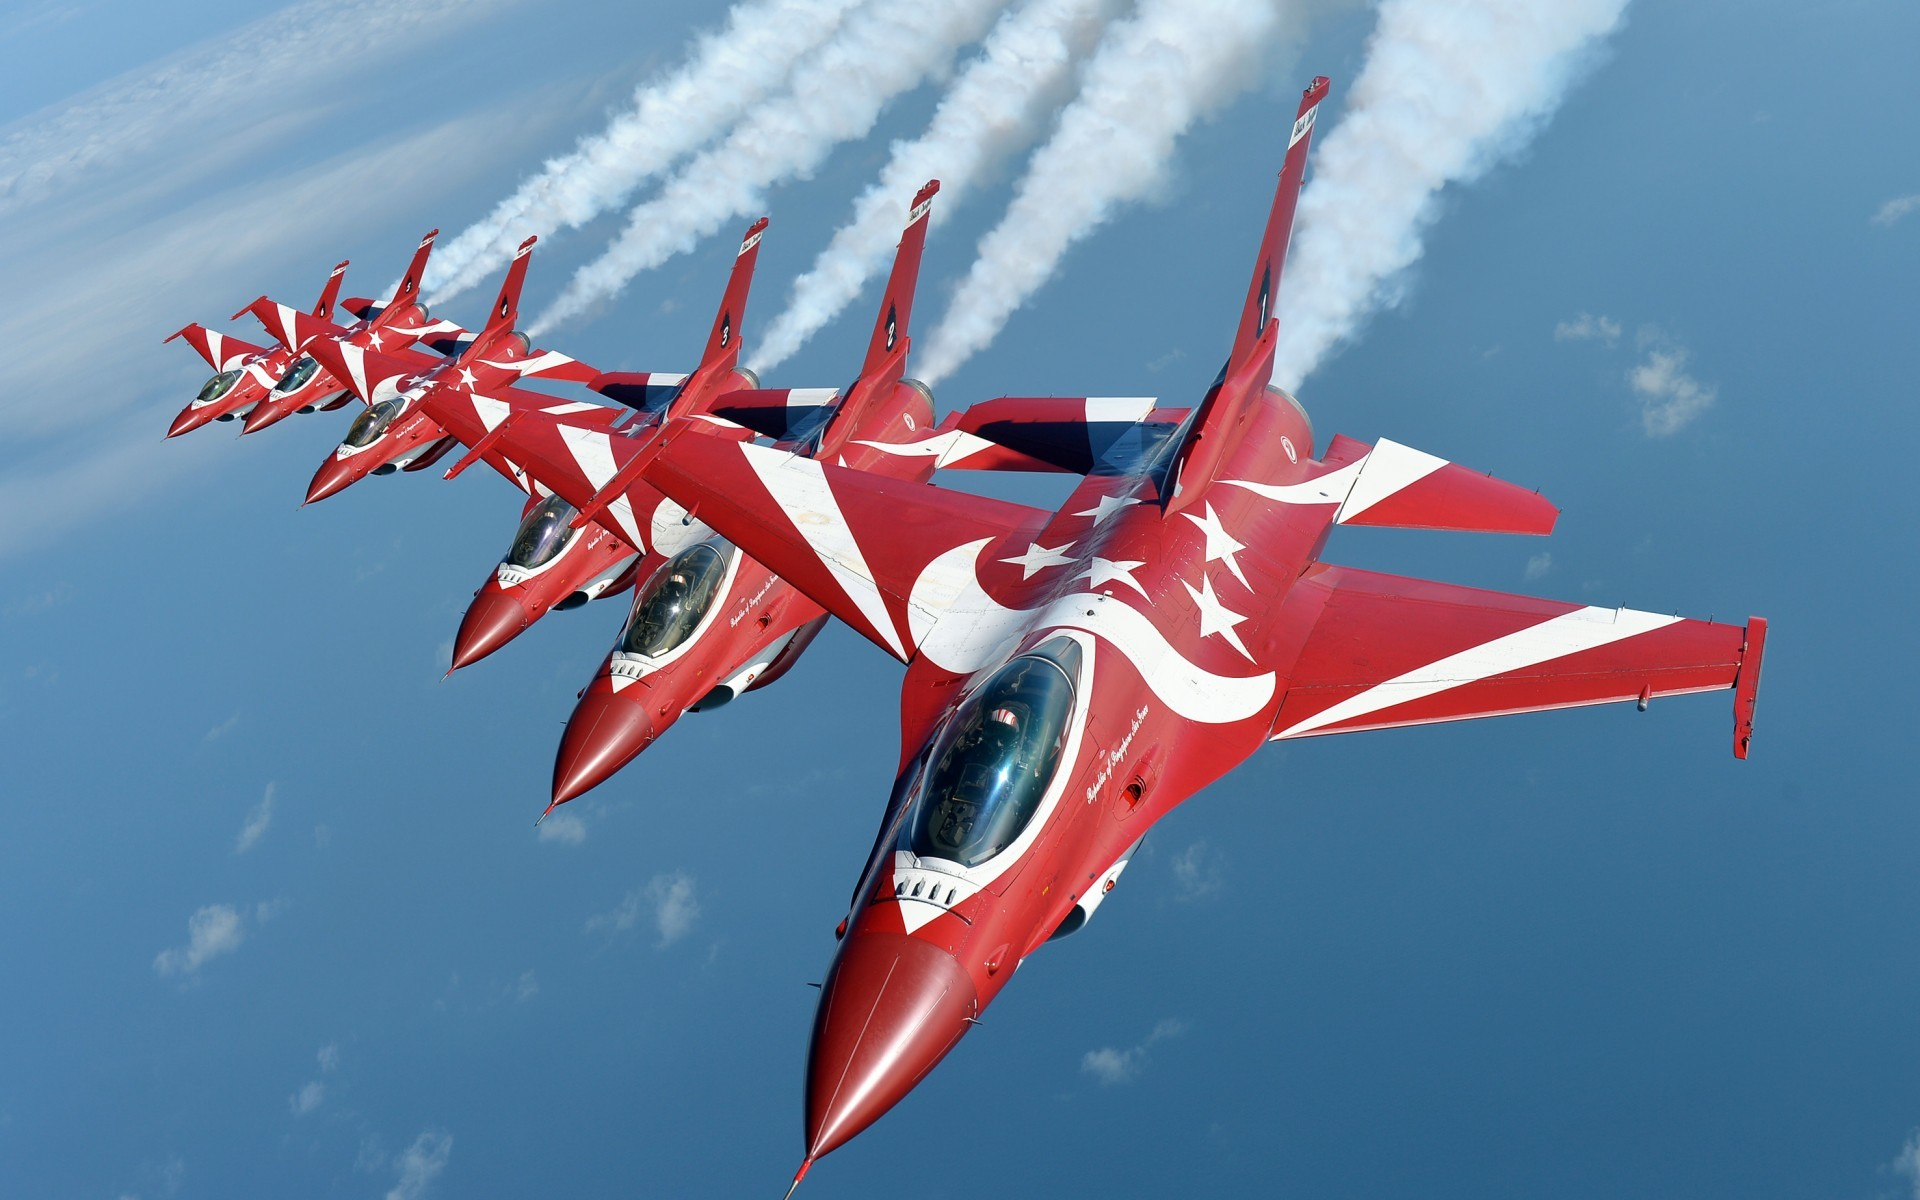 Military / General Dynamics F-16 Fighting Falcon Wallpaper